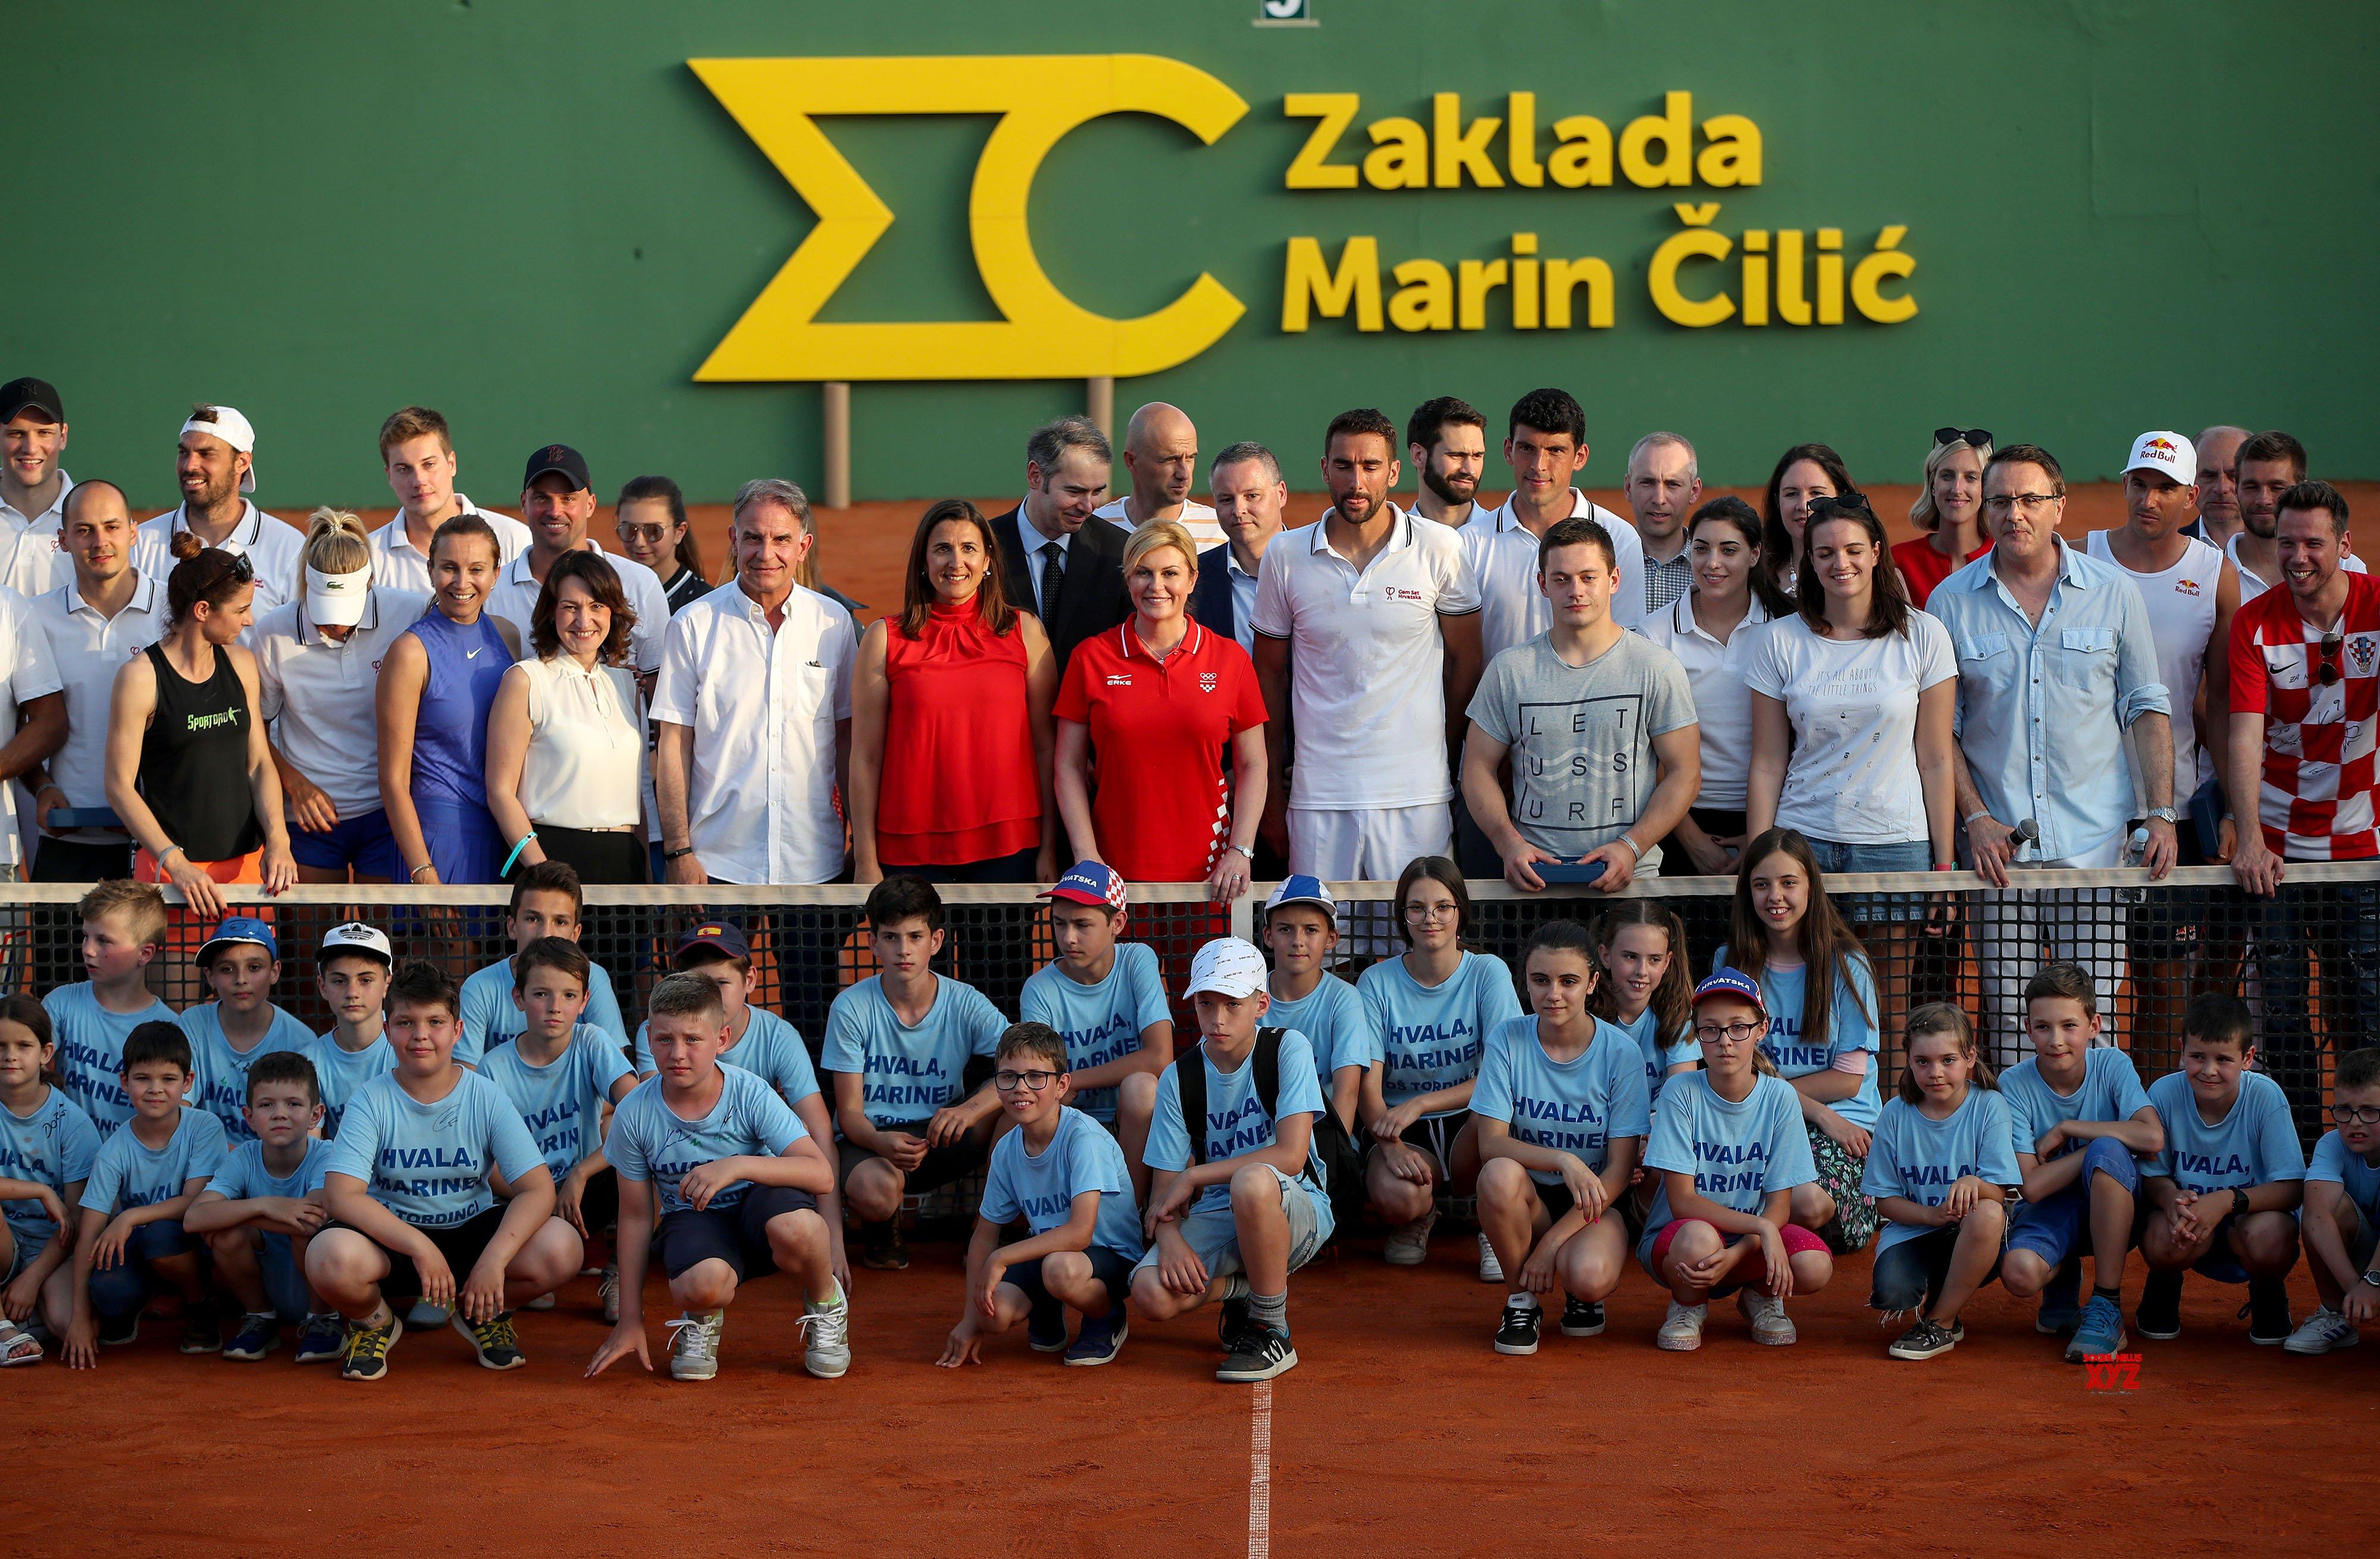 CROATIA - ZAGREB - HUMANITARIAN SPORTS EVENT - GEM SET CROATIA #Gallery